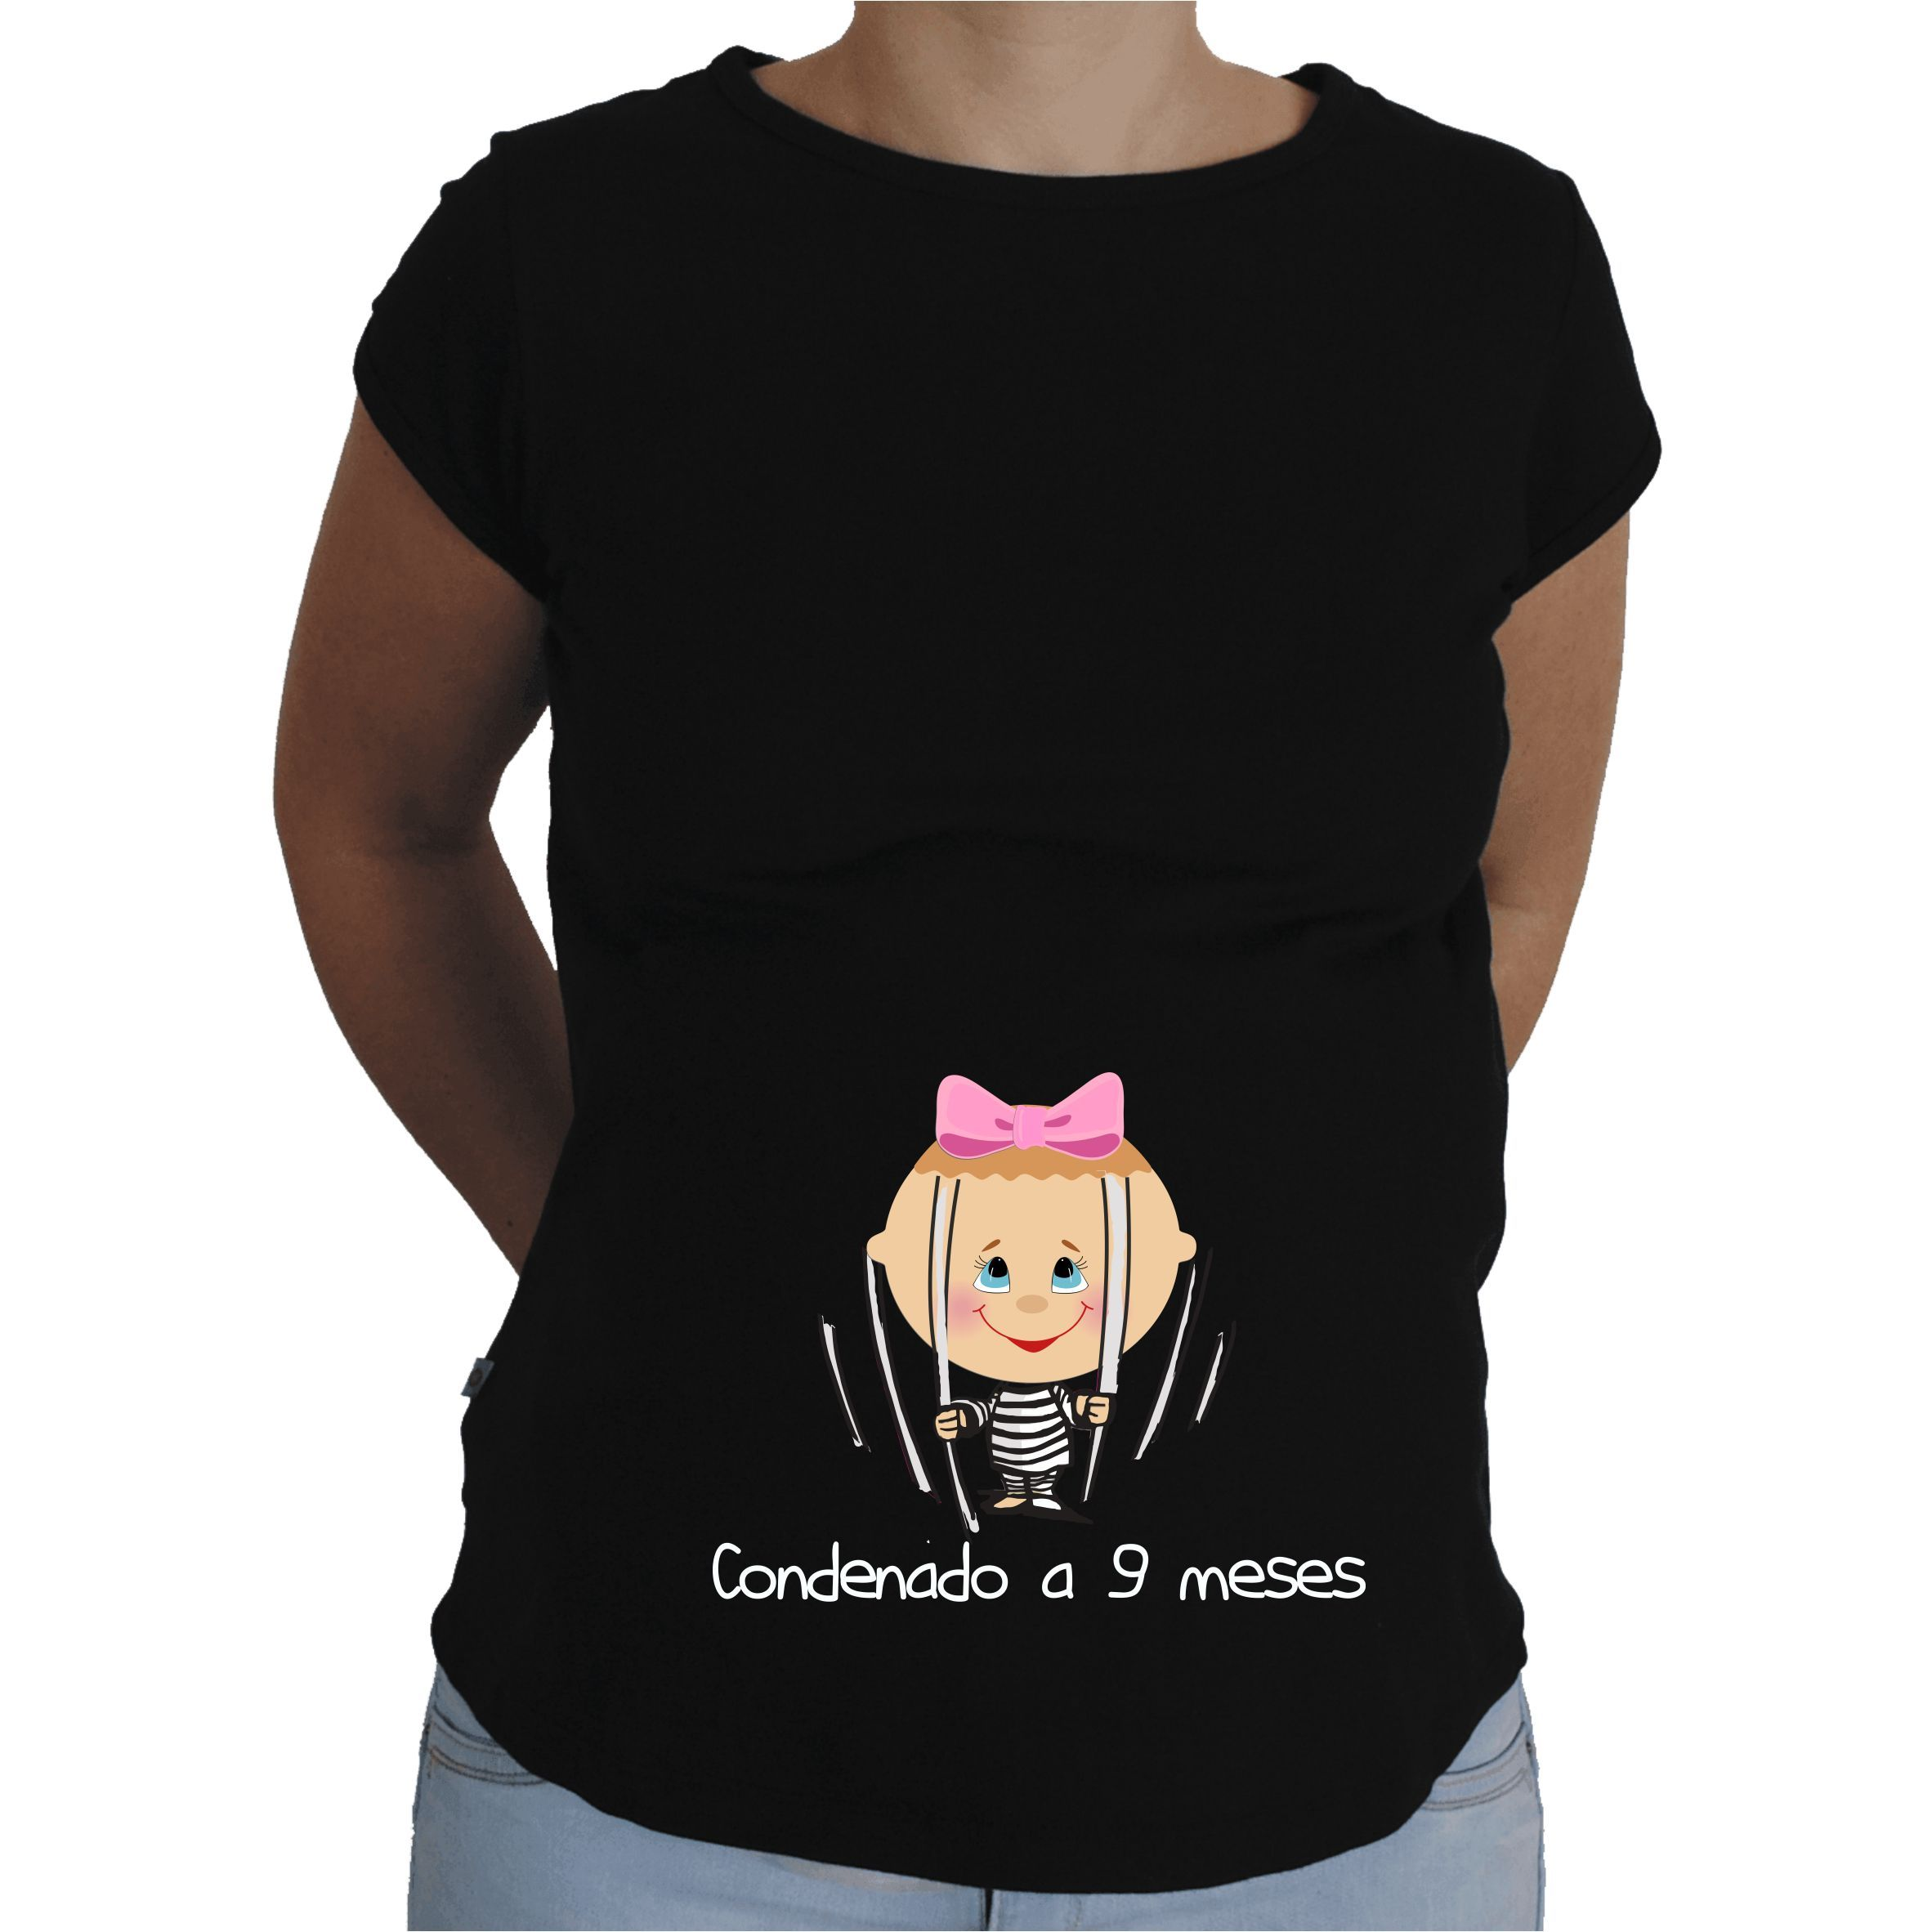 cc2bd128c Camiseta para embarazada Divertida - Condenada a 9 meses ...